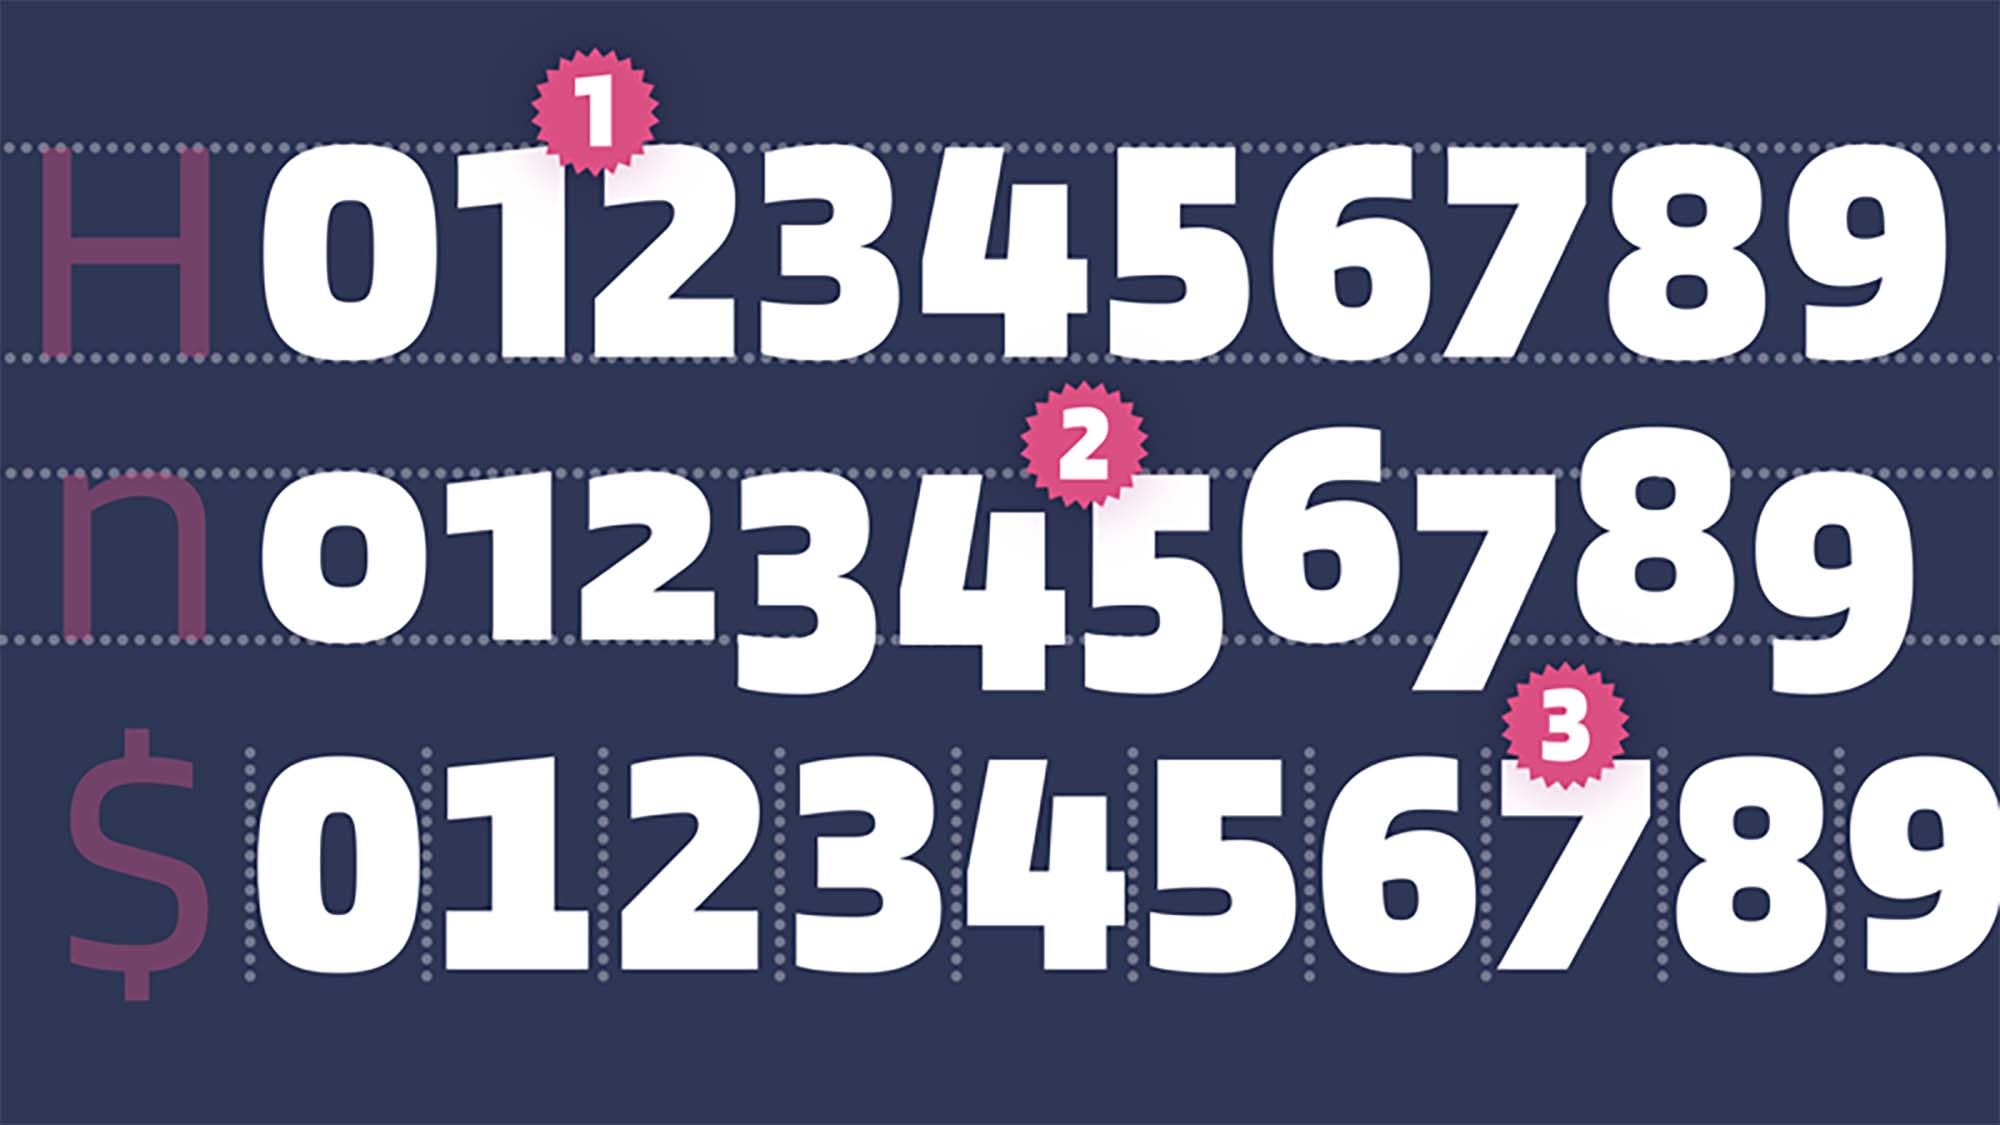 Blinker Font Numbers